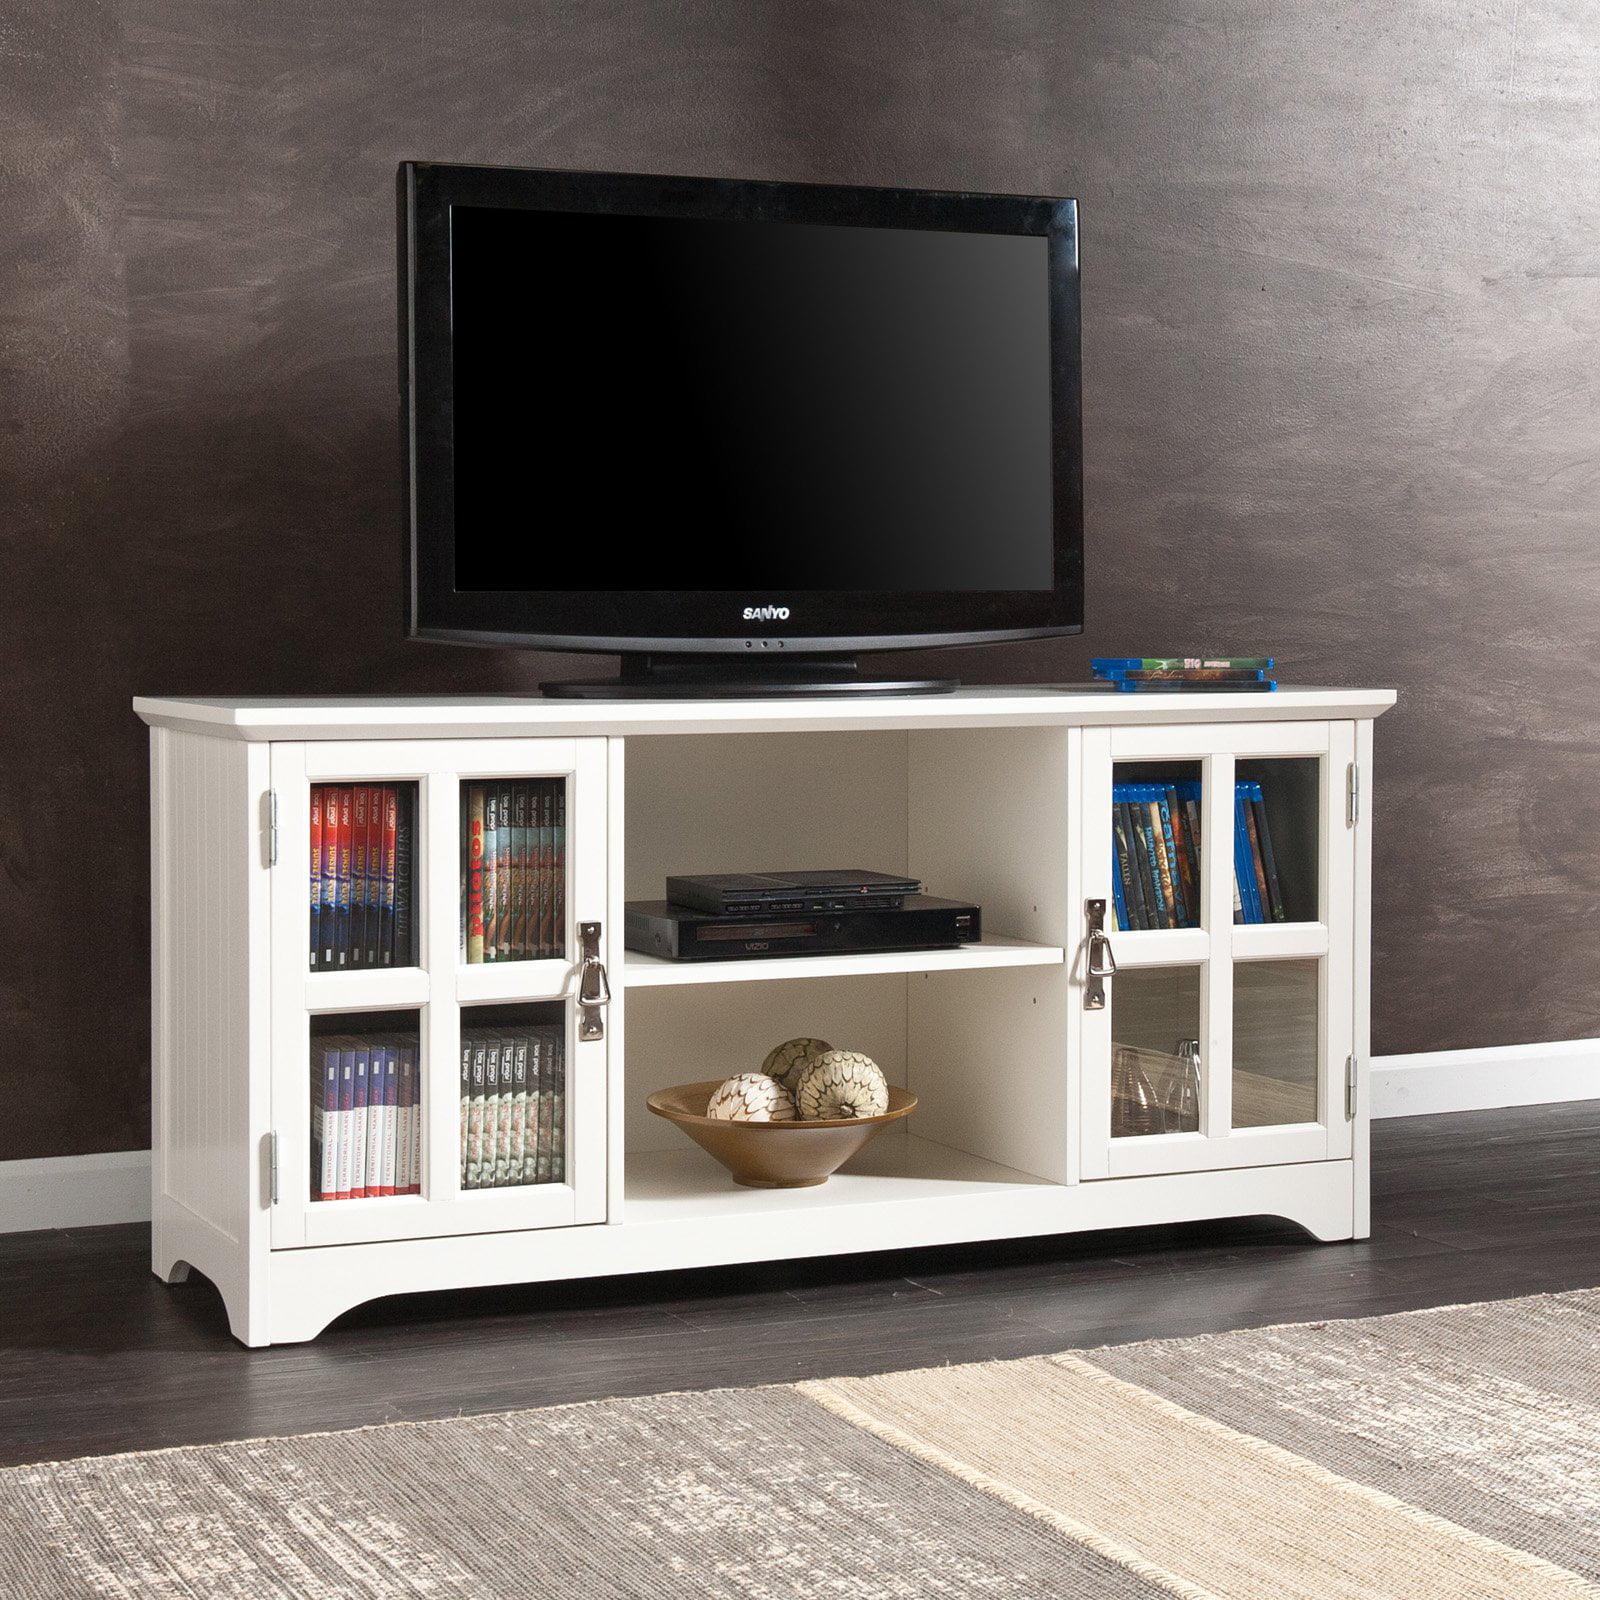 Southern Enterprises Remington TV/Media Stand - White